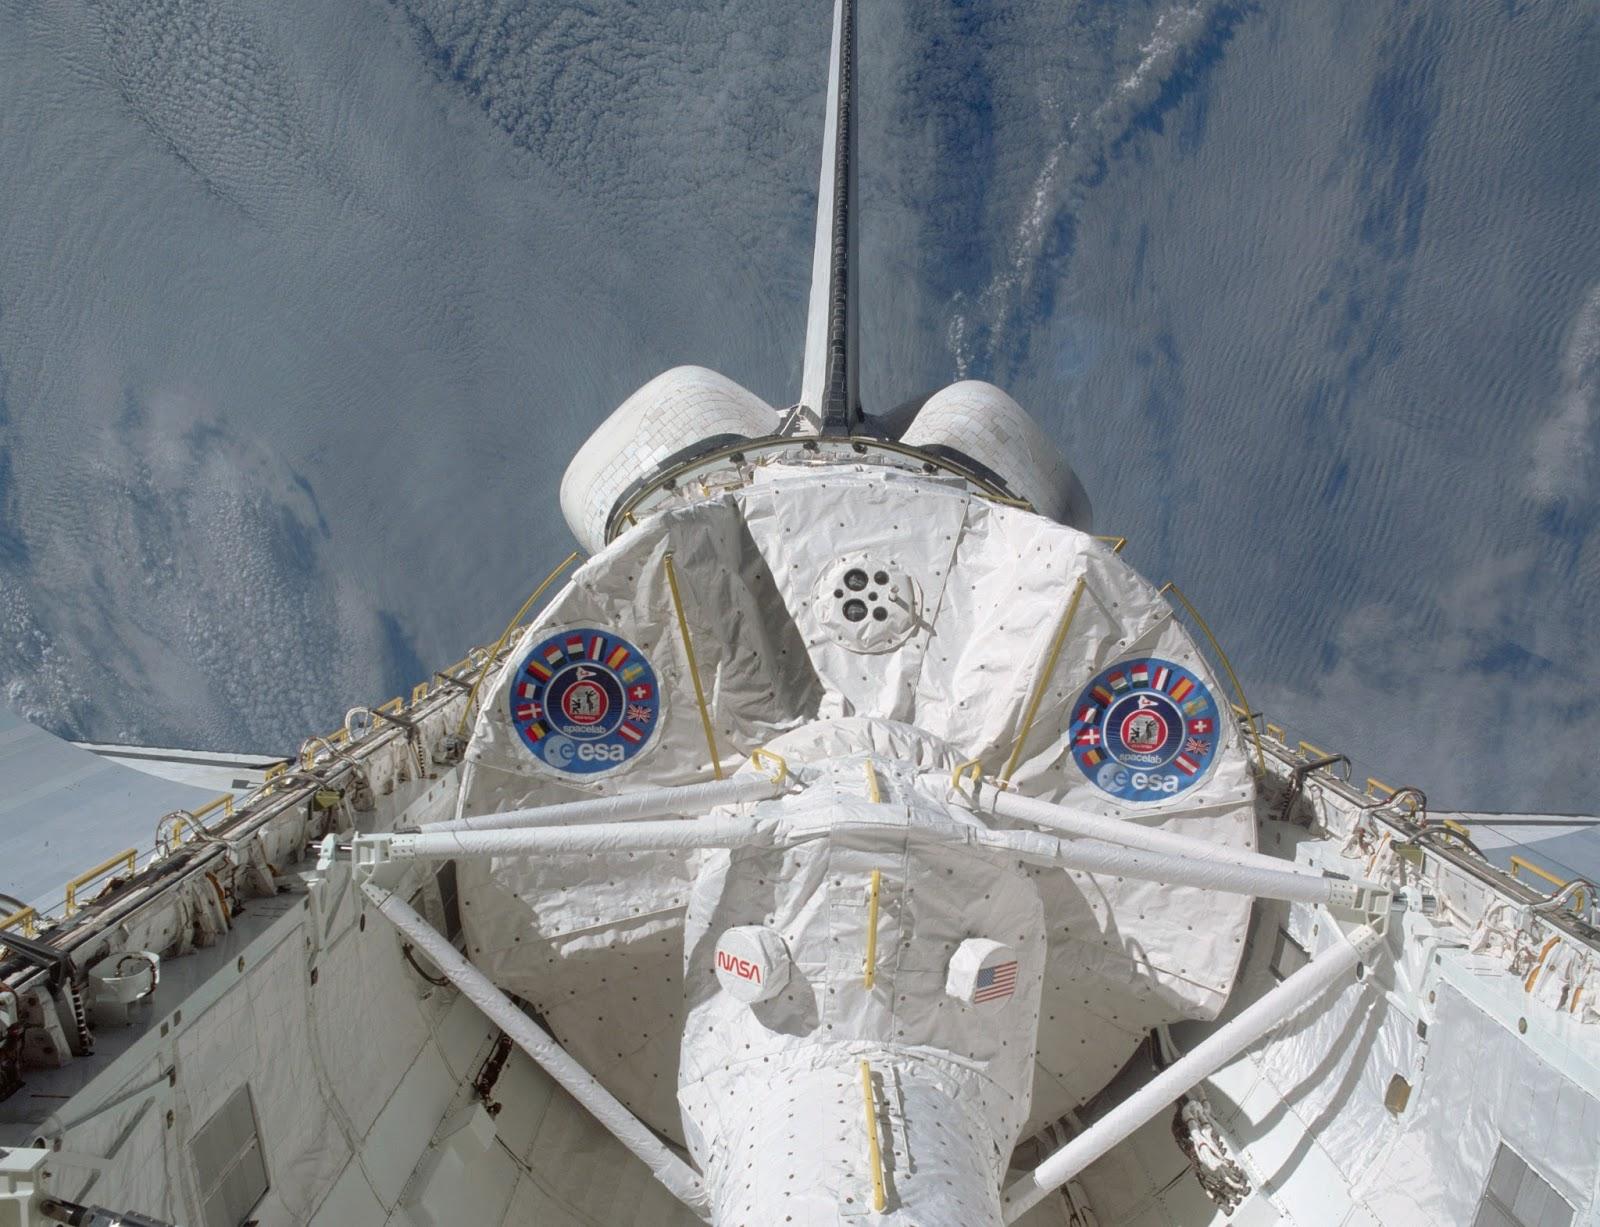 DSFP's Spaceflight History: NASA Johnson's Plan to PEP Up ...